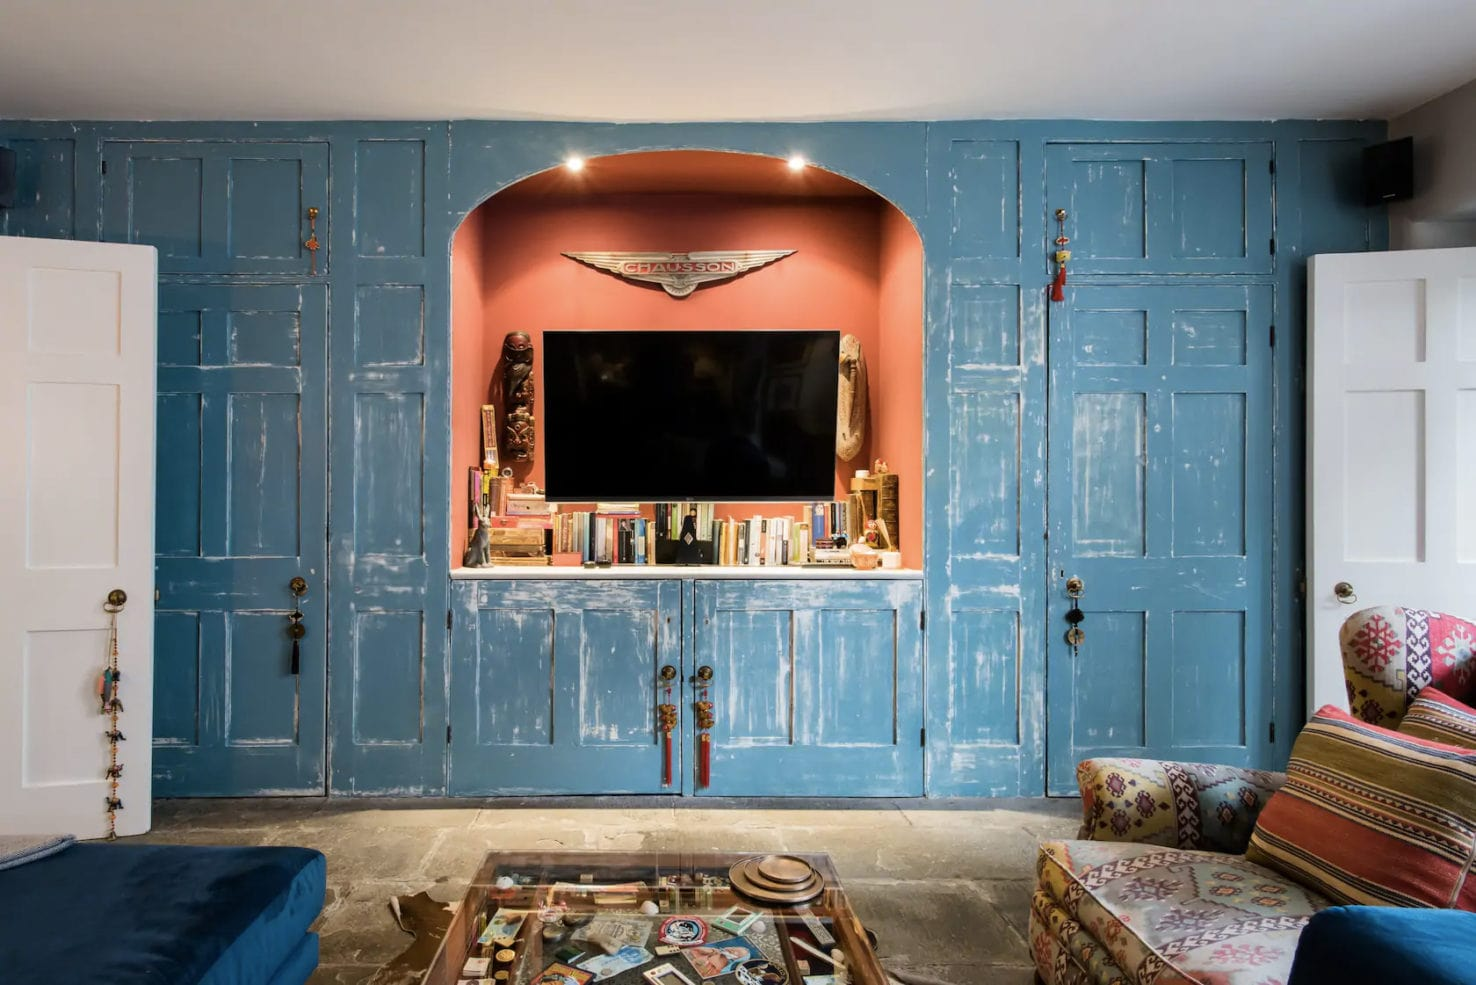 Casa Jane Austin din Bath